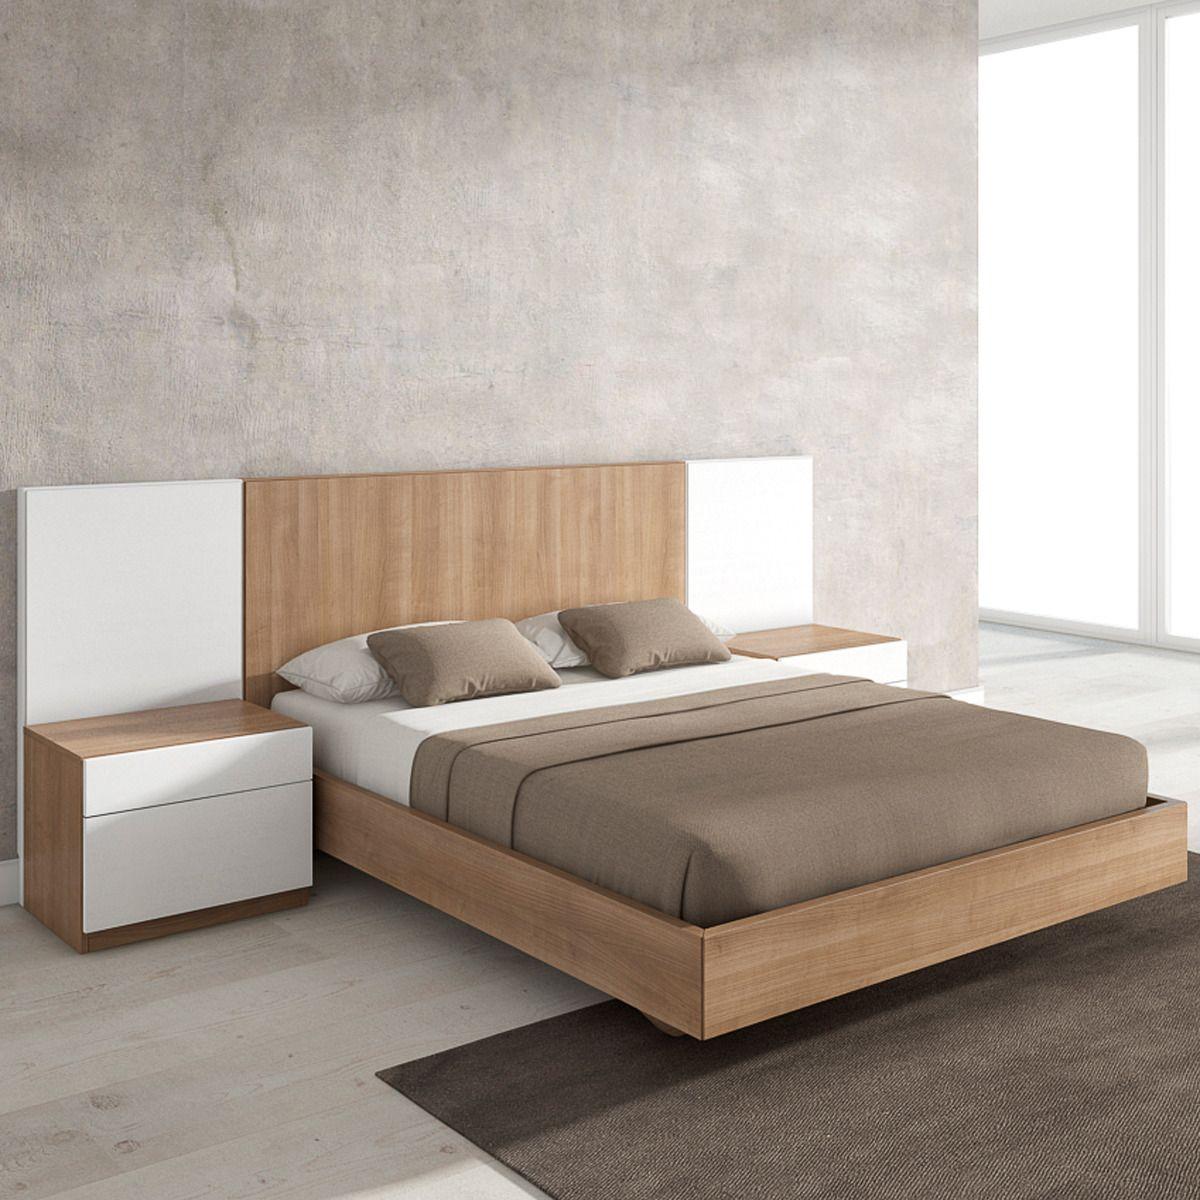 современные спальни дизайн: Mesita De Noche Con 2 Cajones Metrópolis Blanco